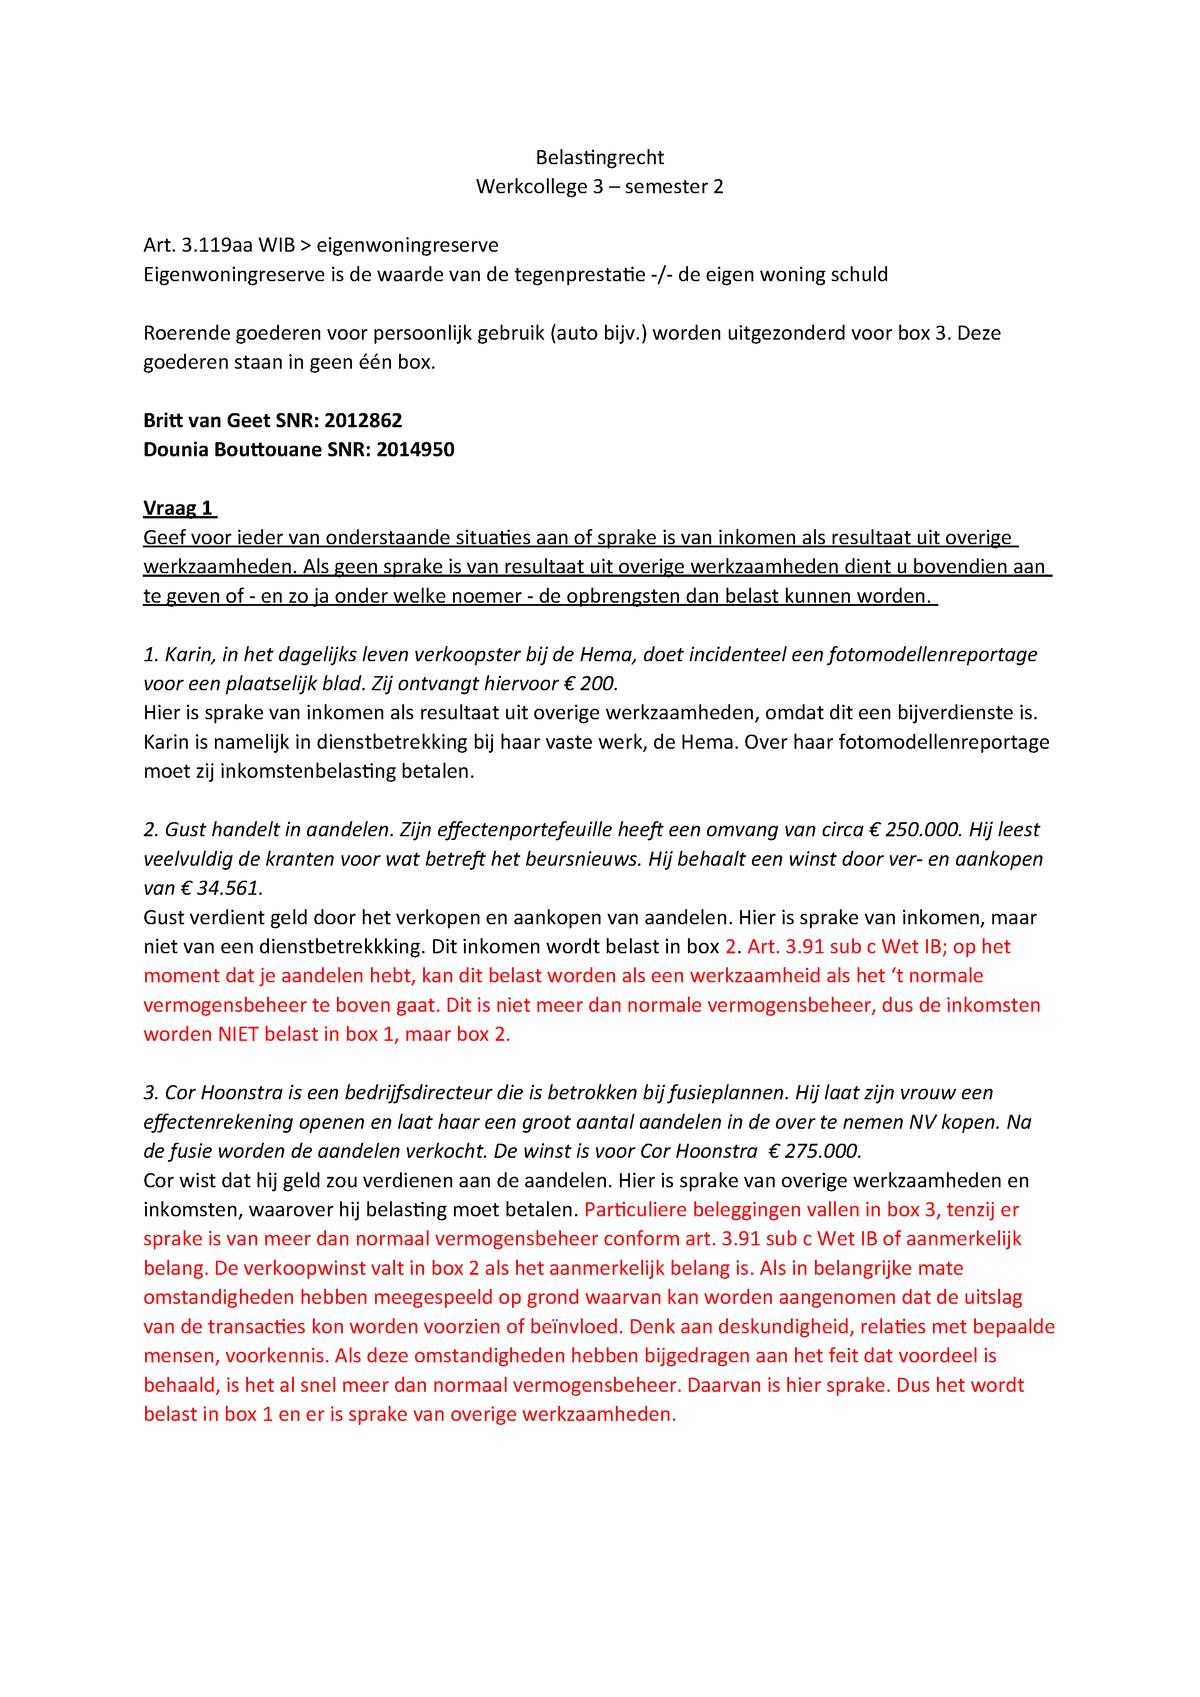 Belastingrecht werkcollege 3 - semester 2 - 695103